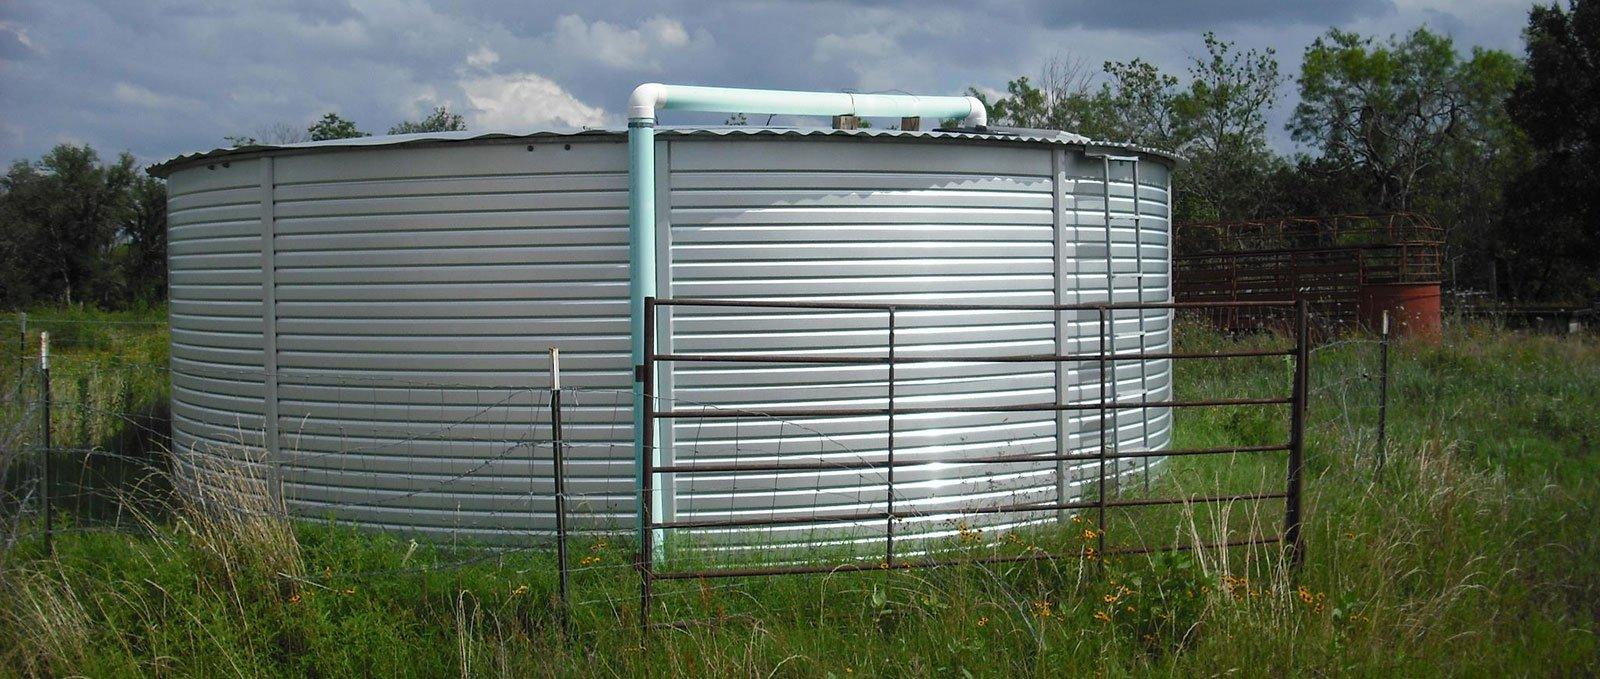 15000 gallon water storage tanks